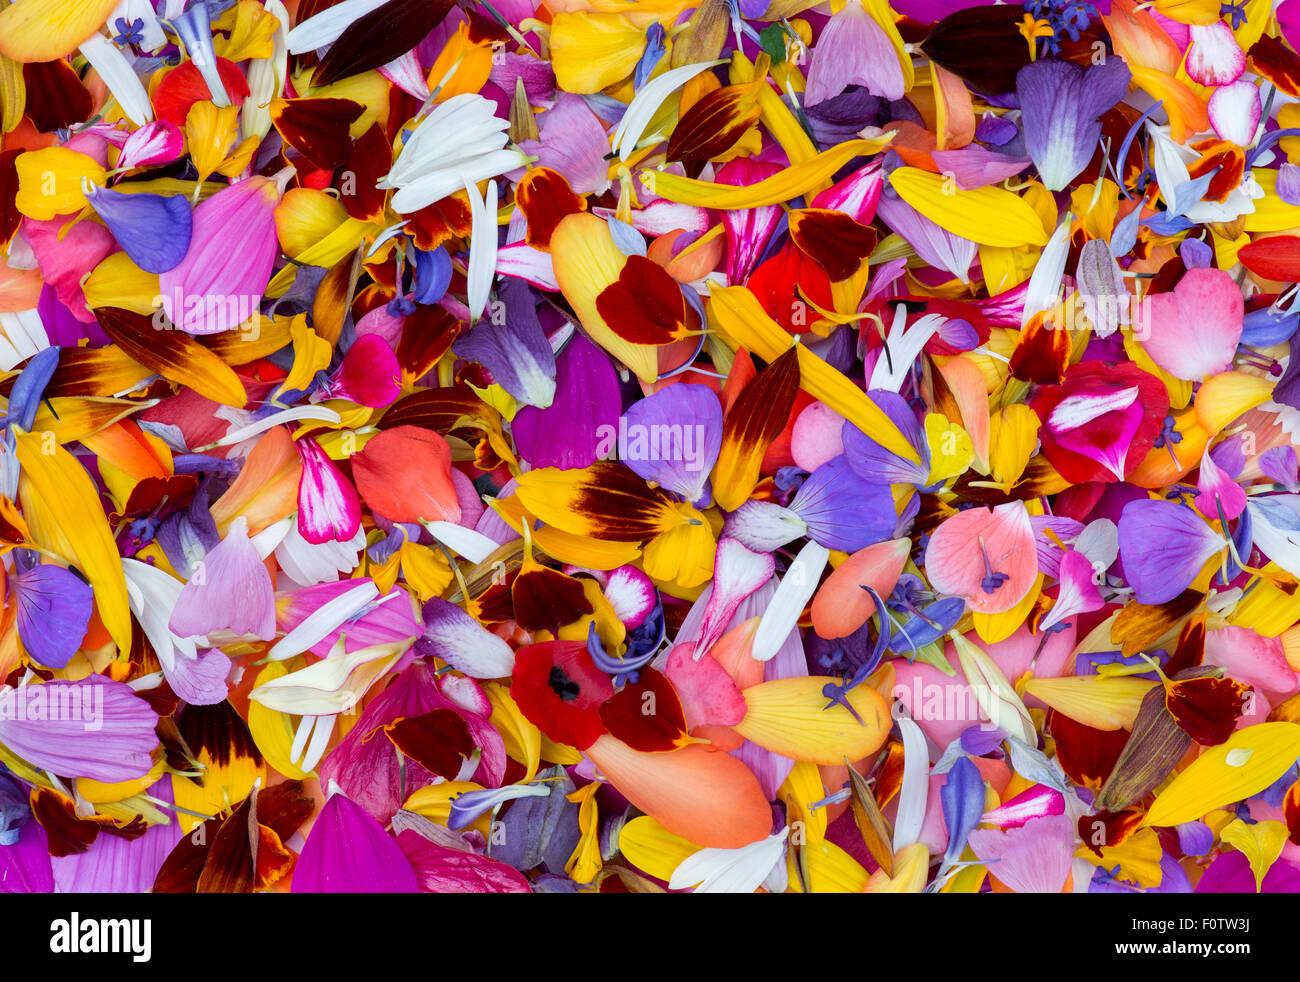 Late summer flower petals pattern - Stock Image